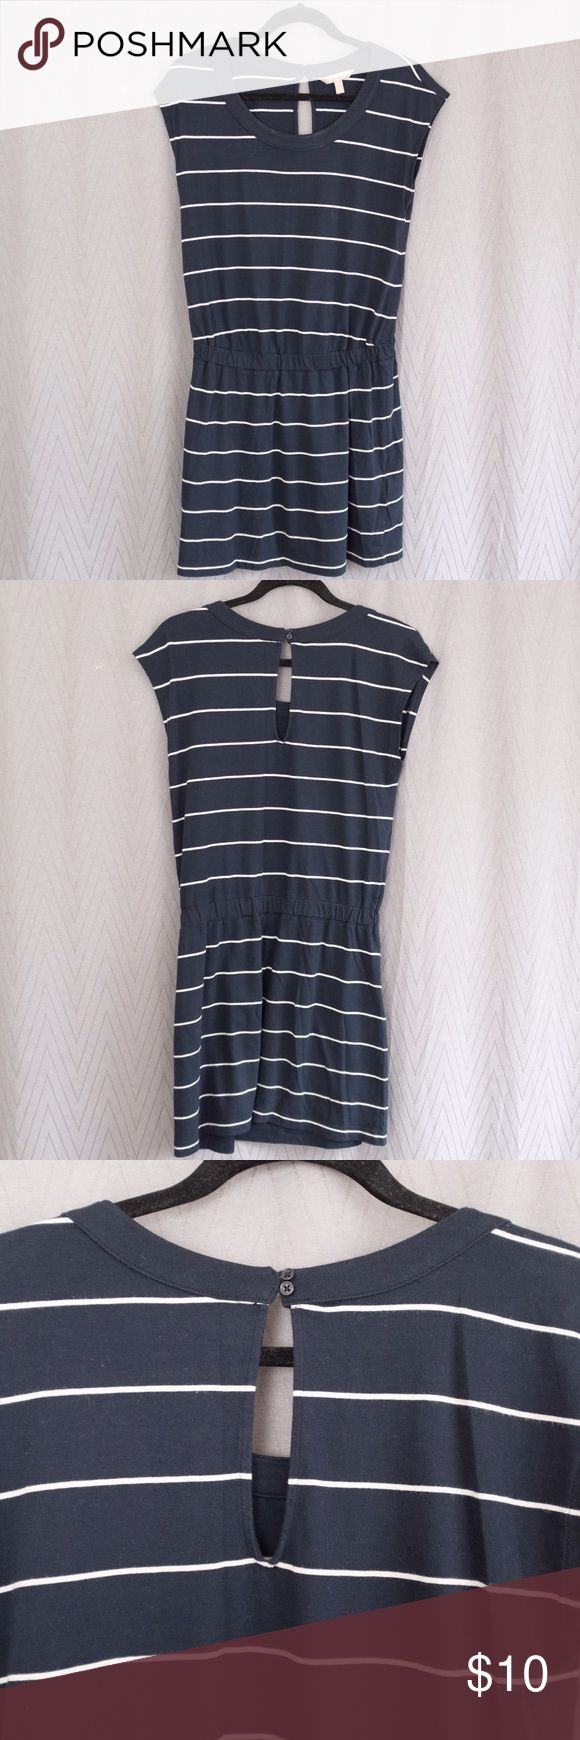 Banana Republic Striped Navy Blue Dress M Petite Striped navy blue dress with white stripes, cinched elastic waist, slit in back with button Banana Republic Dresses